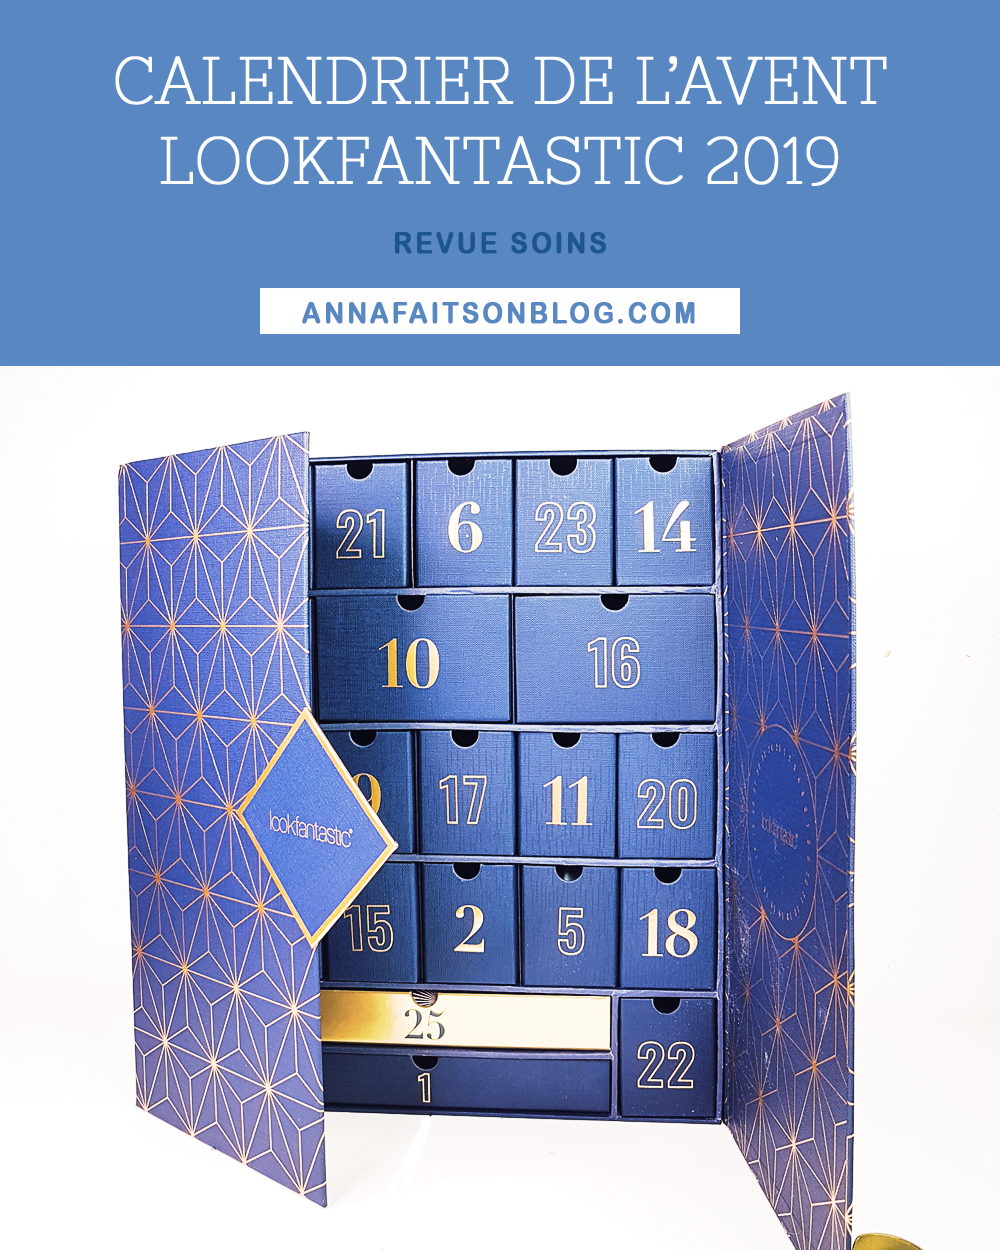 Calendrier Lookfantastic 2019